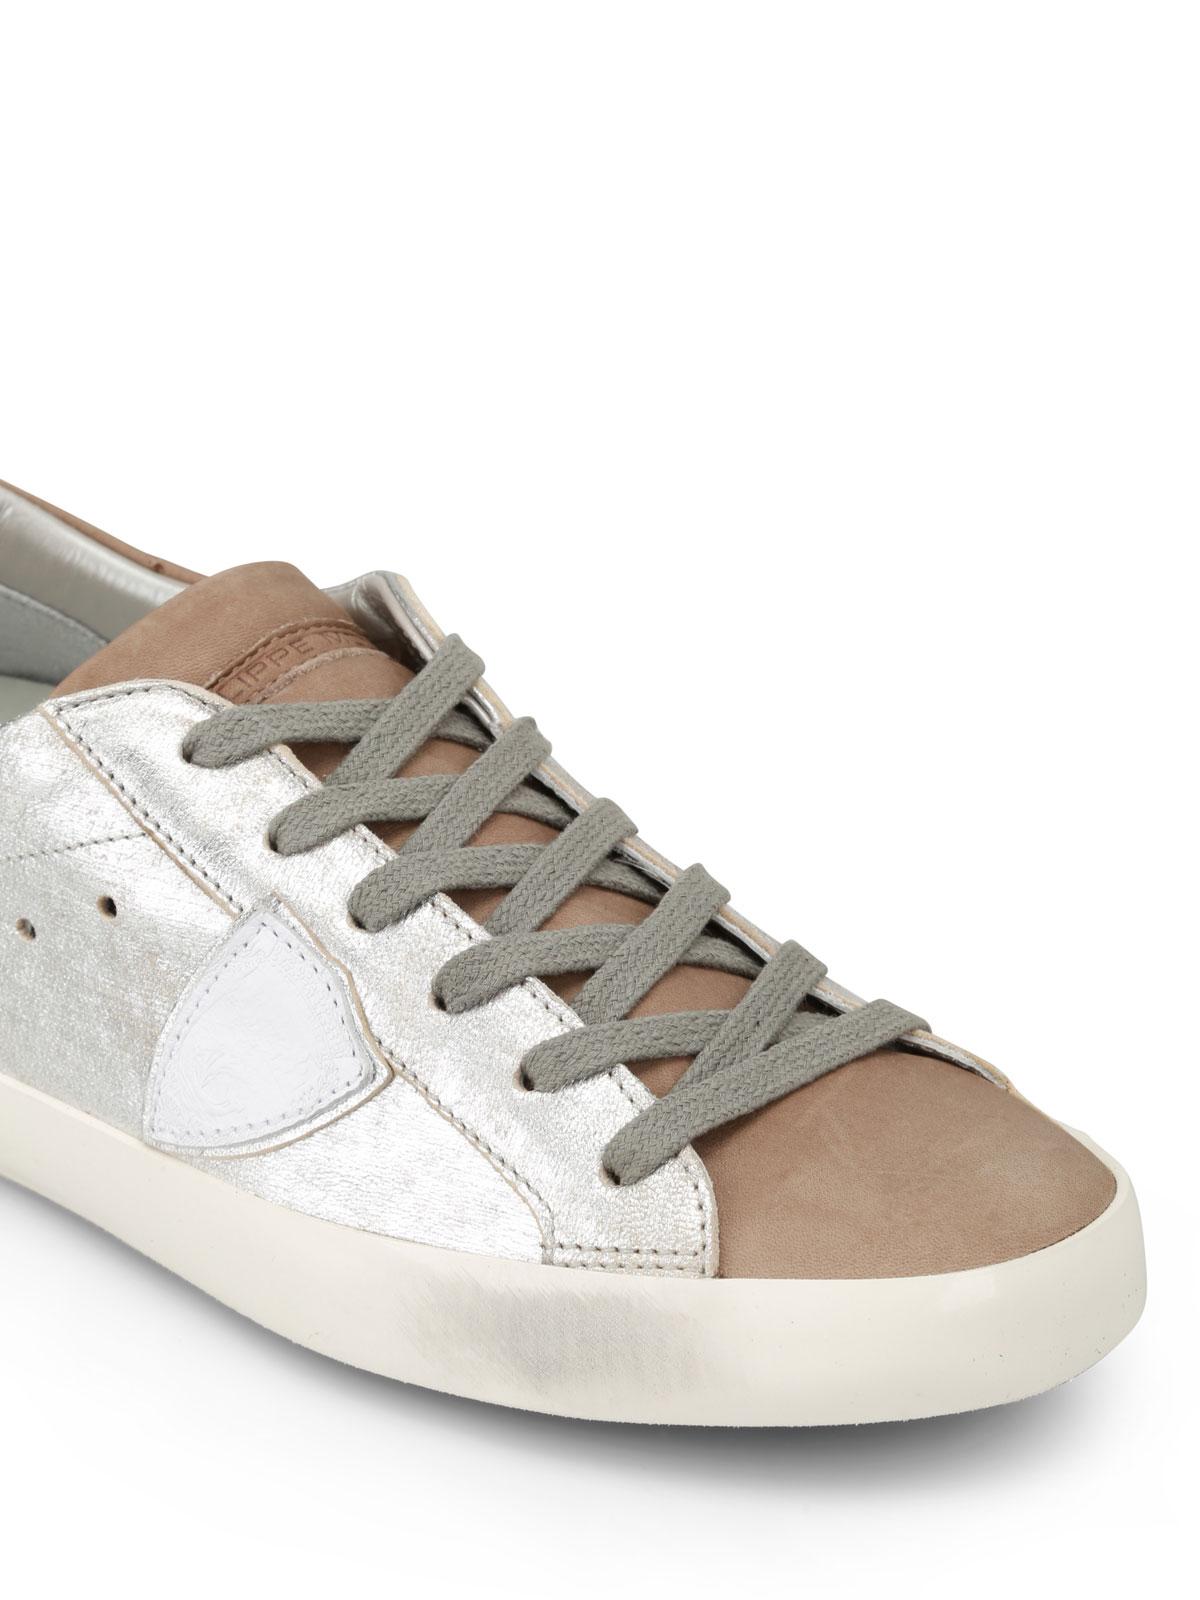 Paris metallic sneakers Philippe Model tn7DqBb